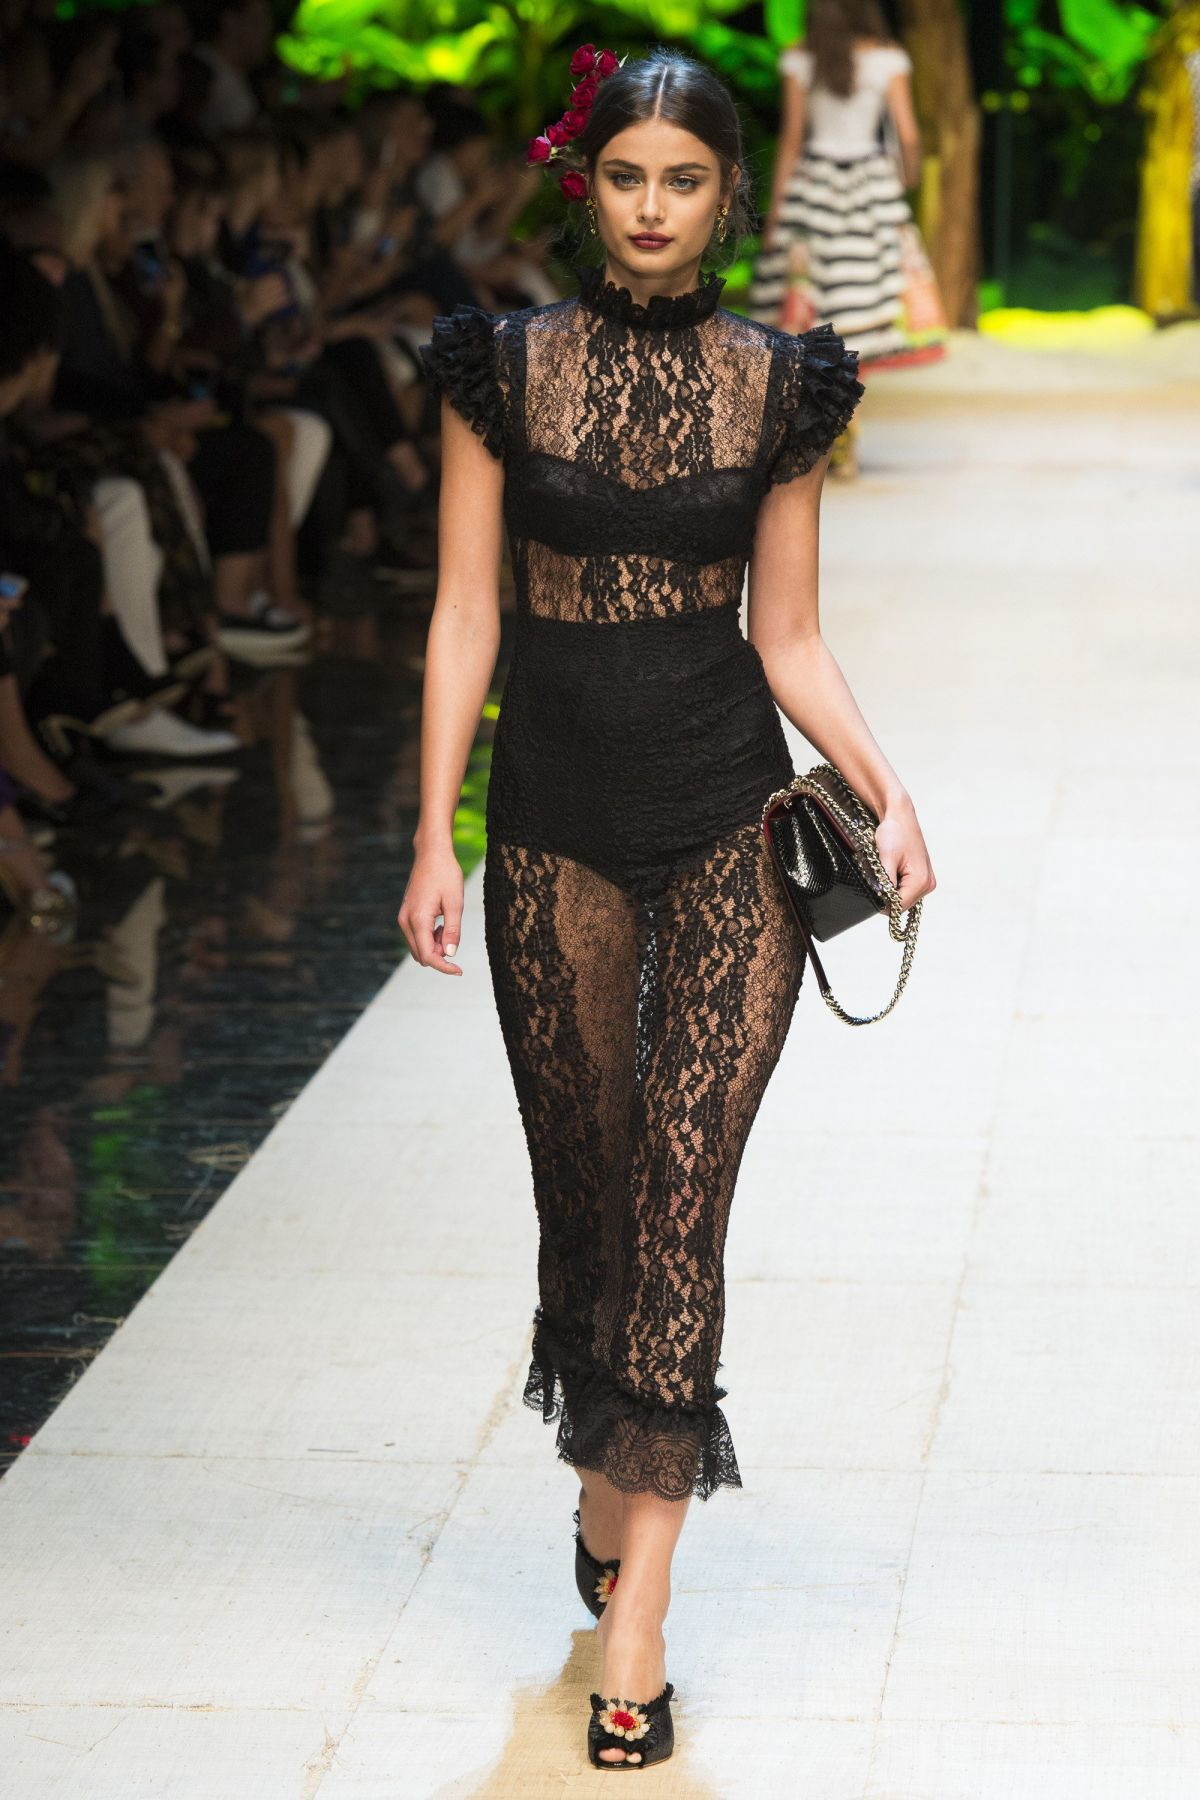 Taylor Hill On The Runway At Dolce Gabbana Fashion Show At Milan Fashion Week 09 25 2016